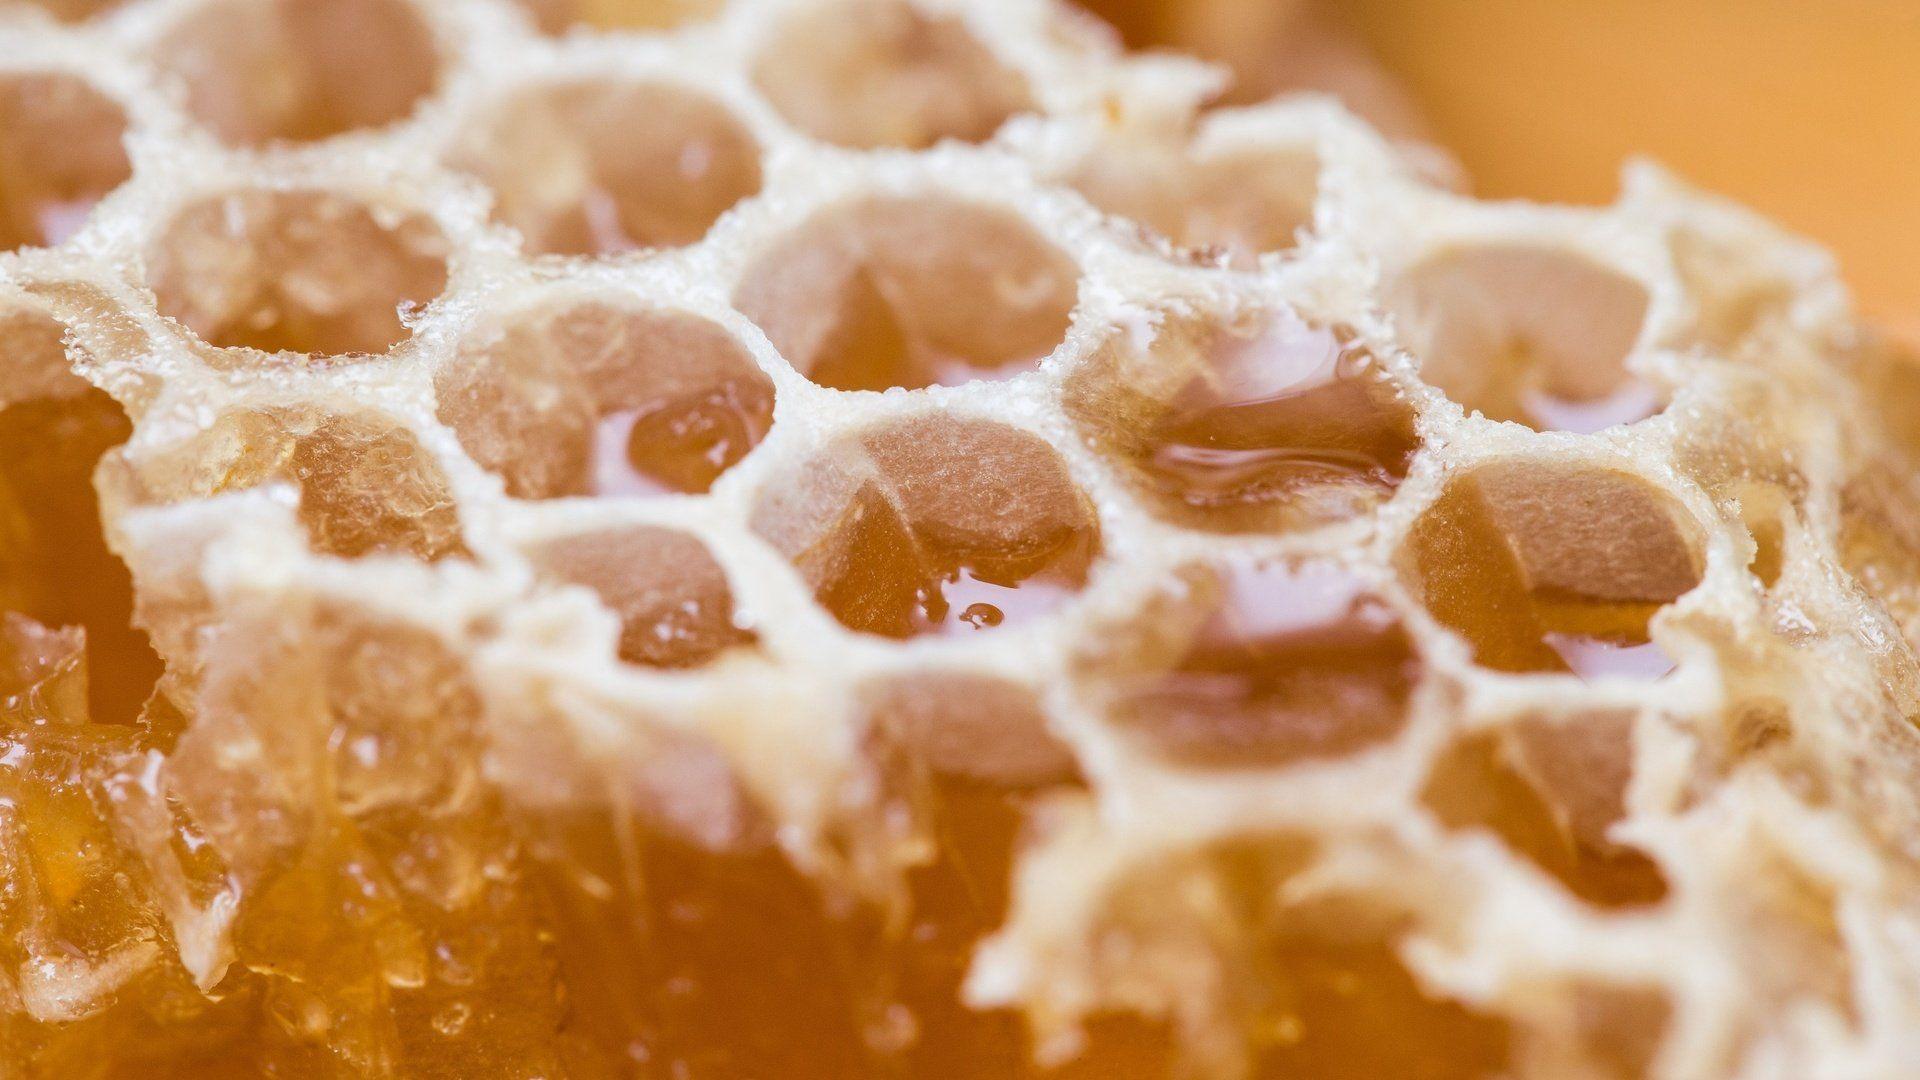 Honey download wallpaper image